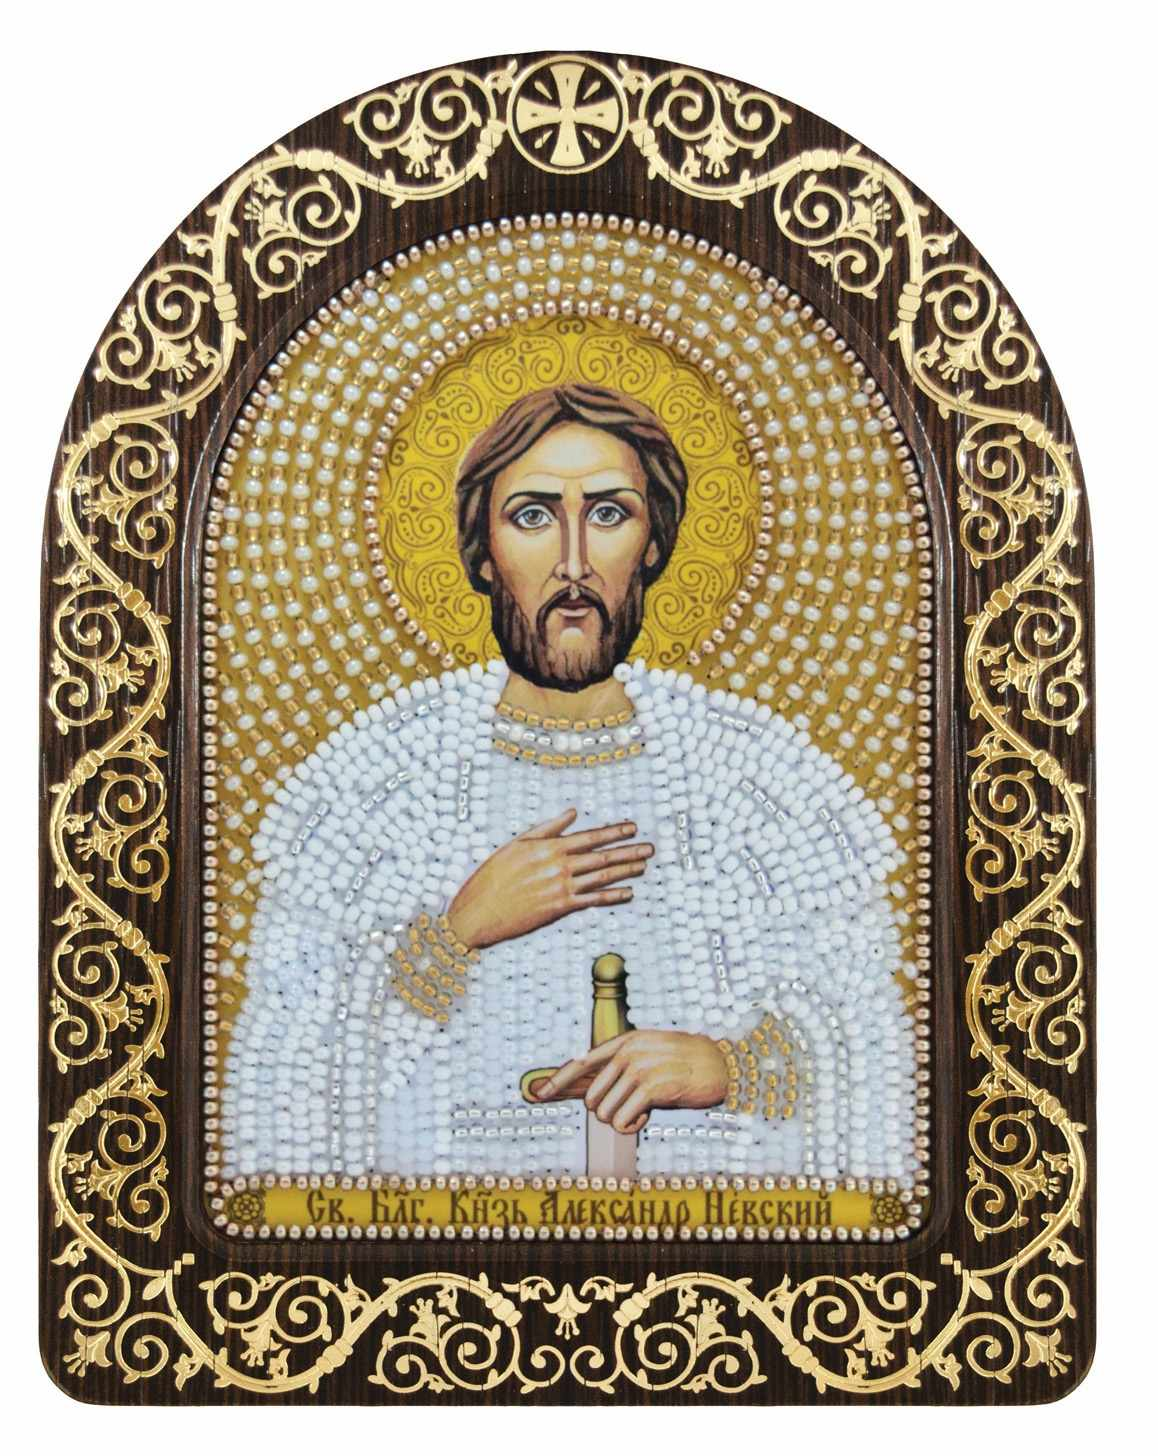 СН 5018 Св. Блгв. Великий Князь Александр Невский